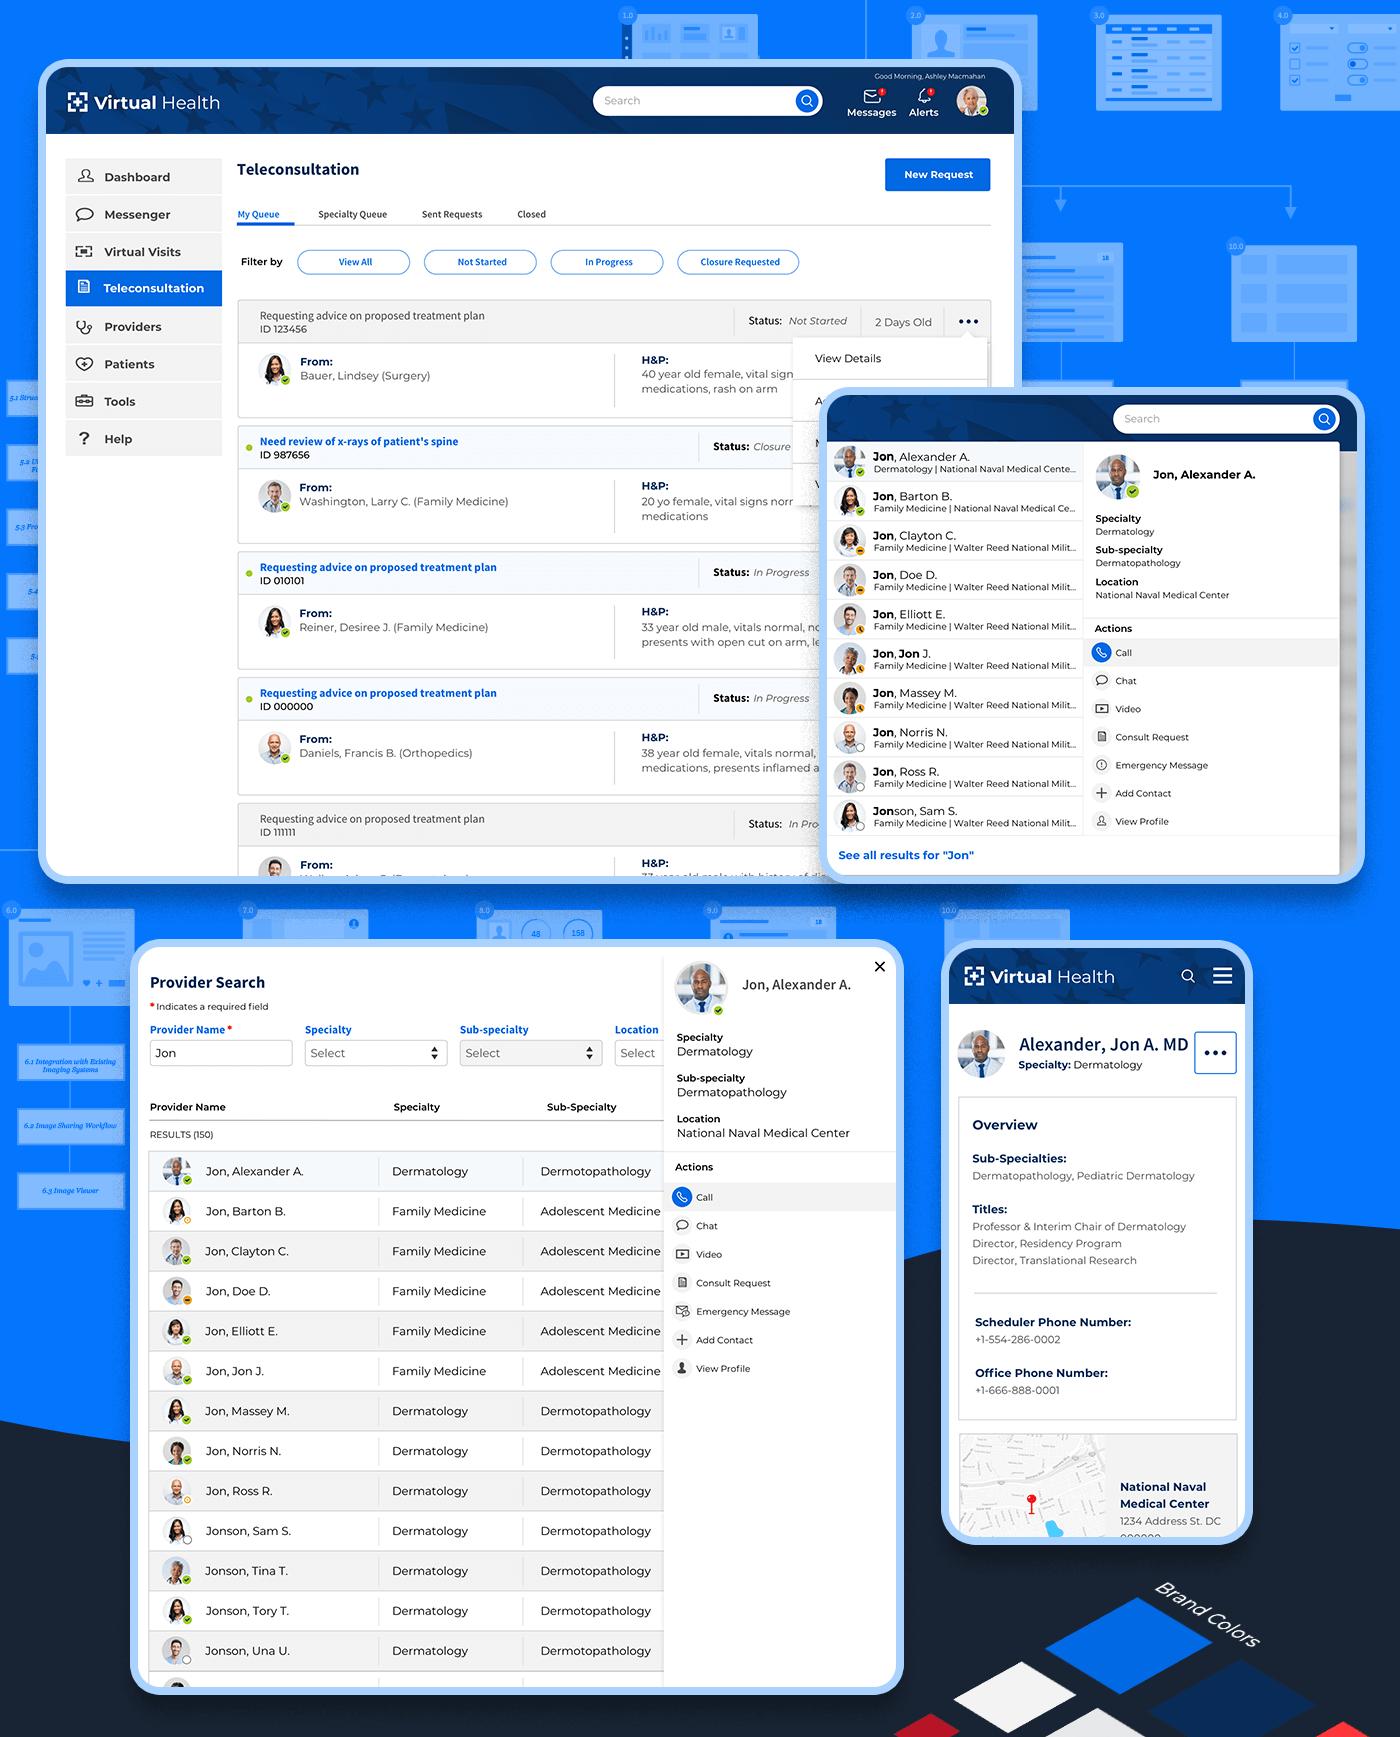 corona virus corporate COVid digital Health virtual app design branding  UI/UX Web Design